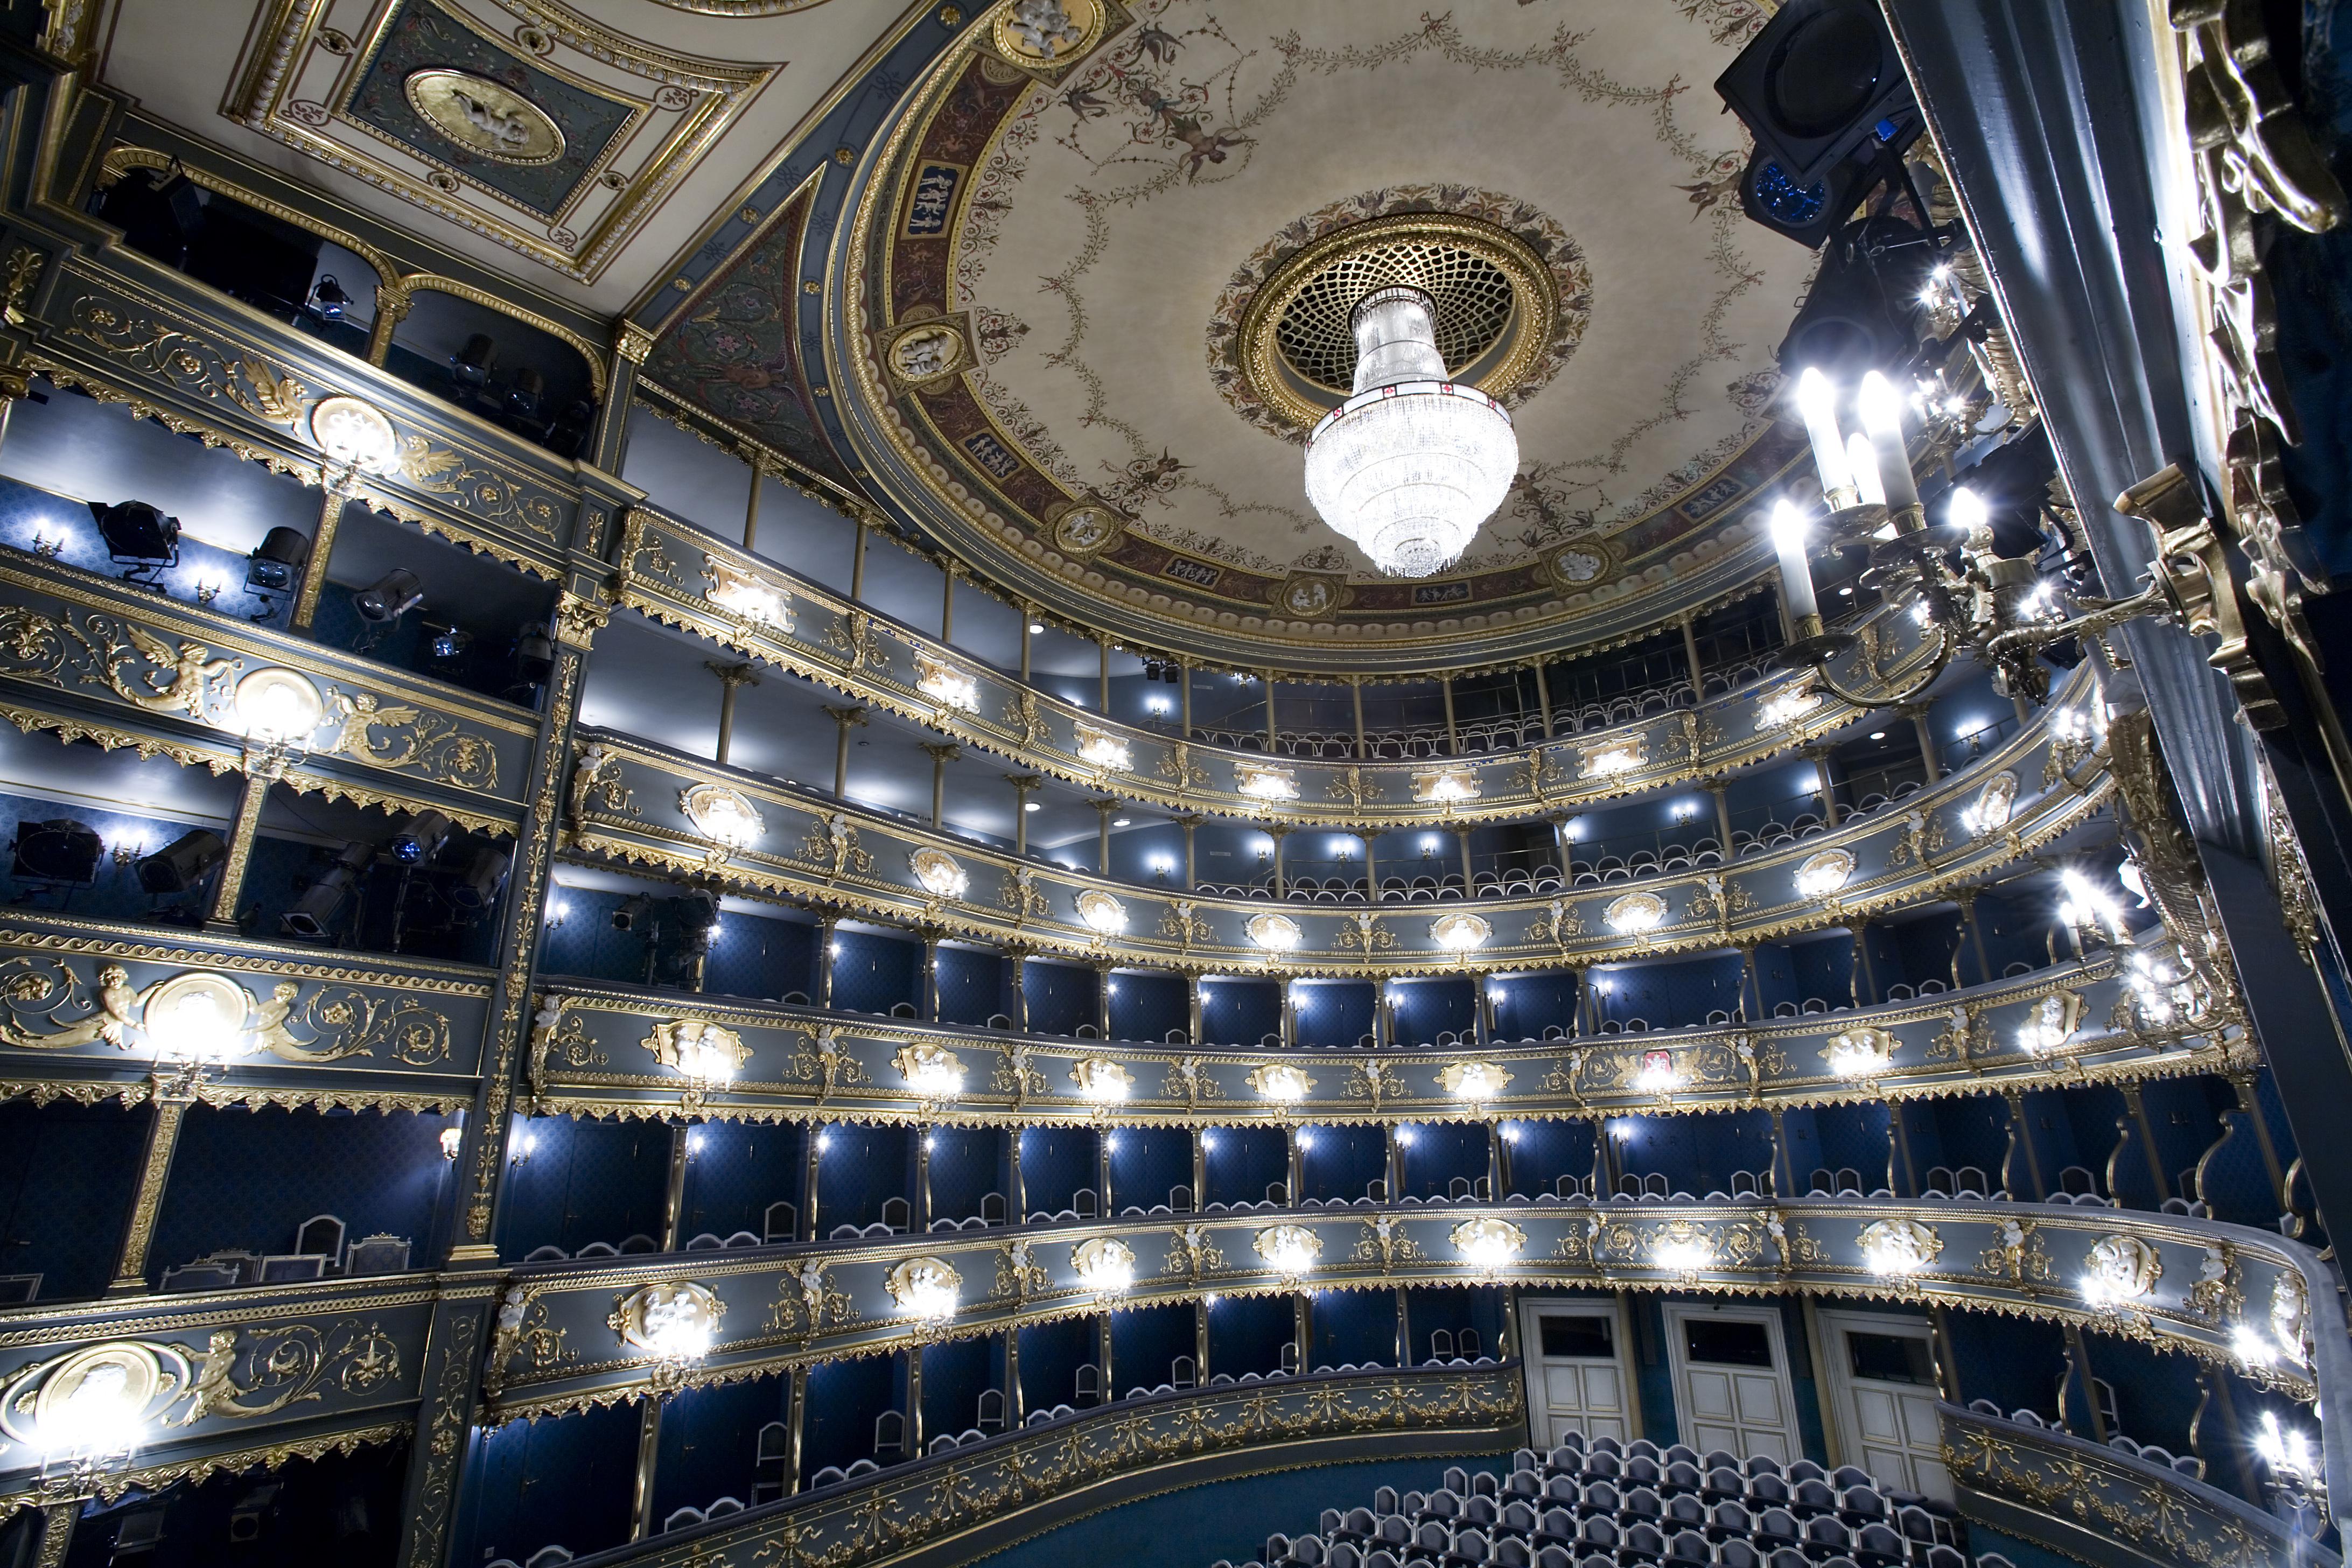 Narodni Divadlo, Estates Theater in Prague. Photography: Jorge Royan